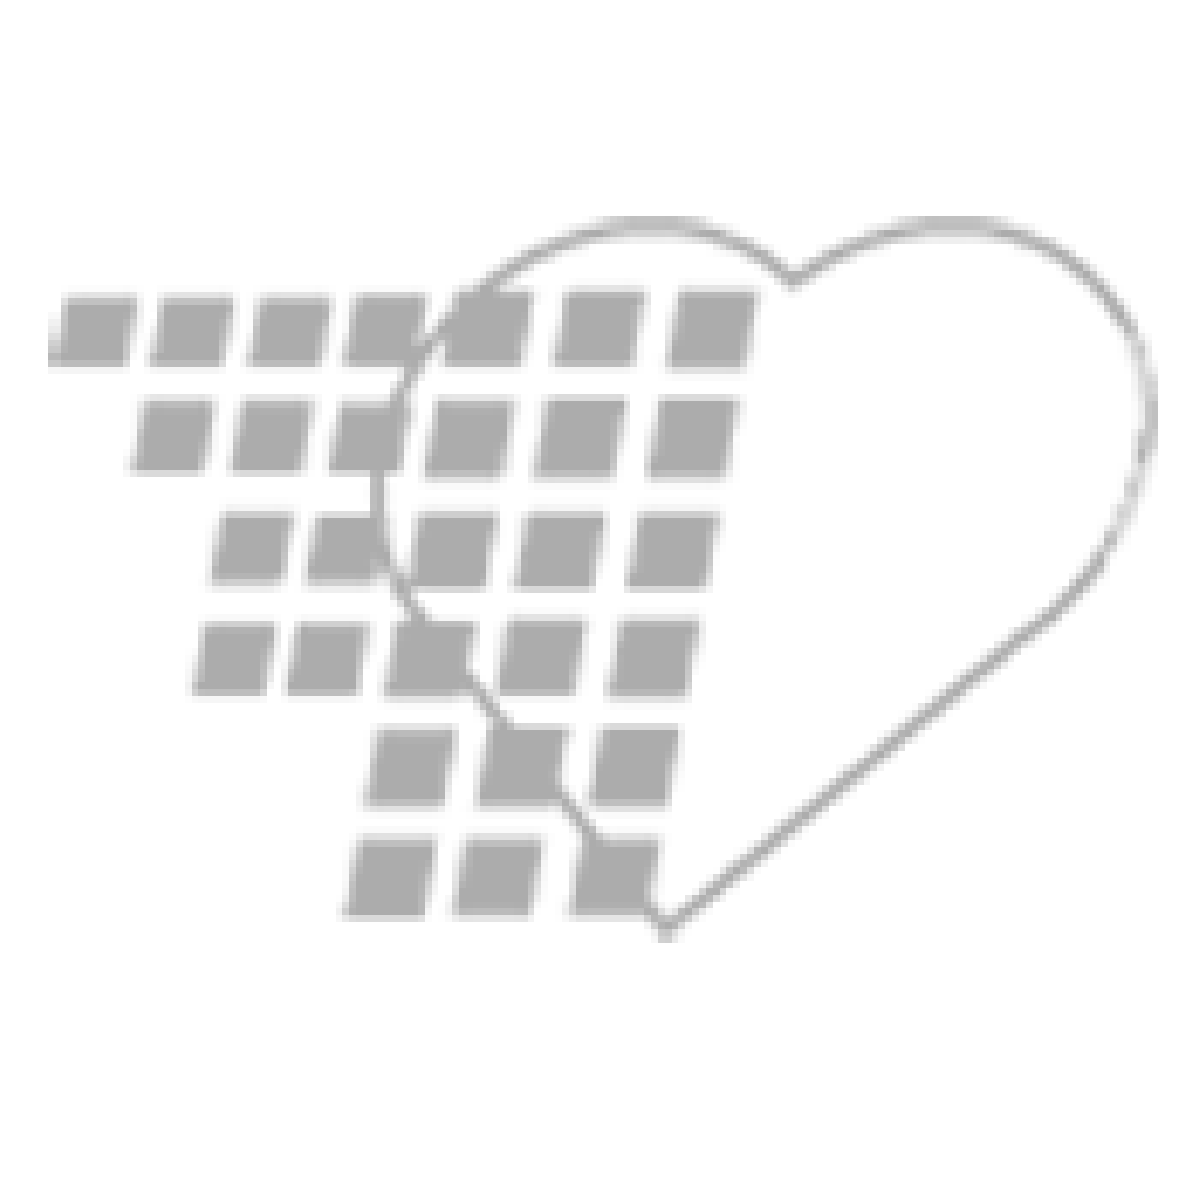 02-20-0732 - Multikuf   Portable 4 Cuff Sphyg Kit